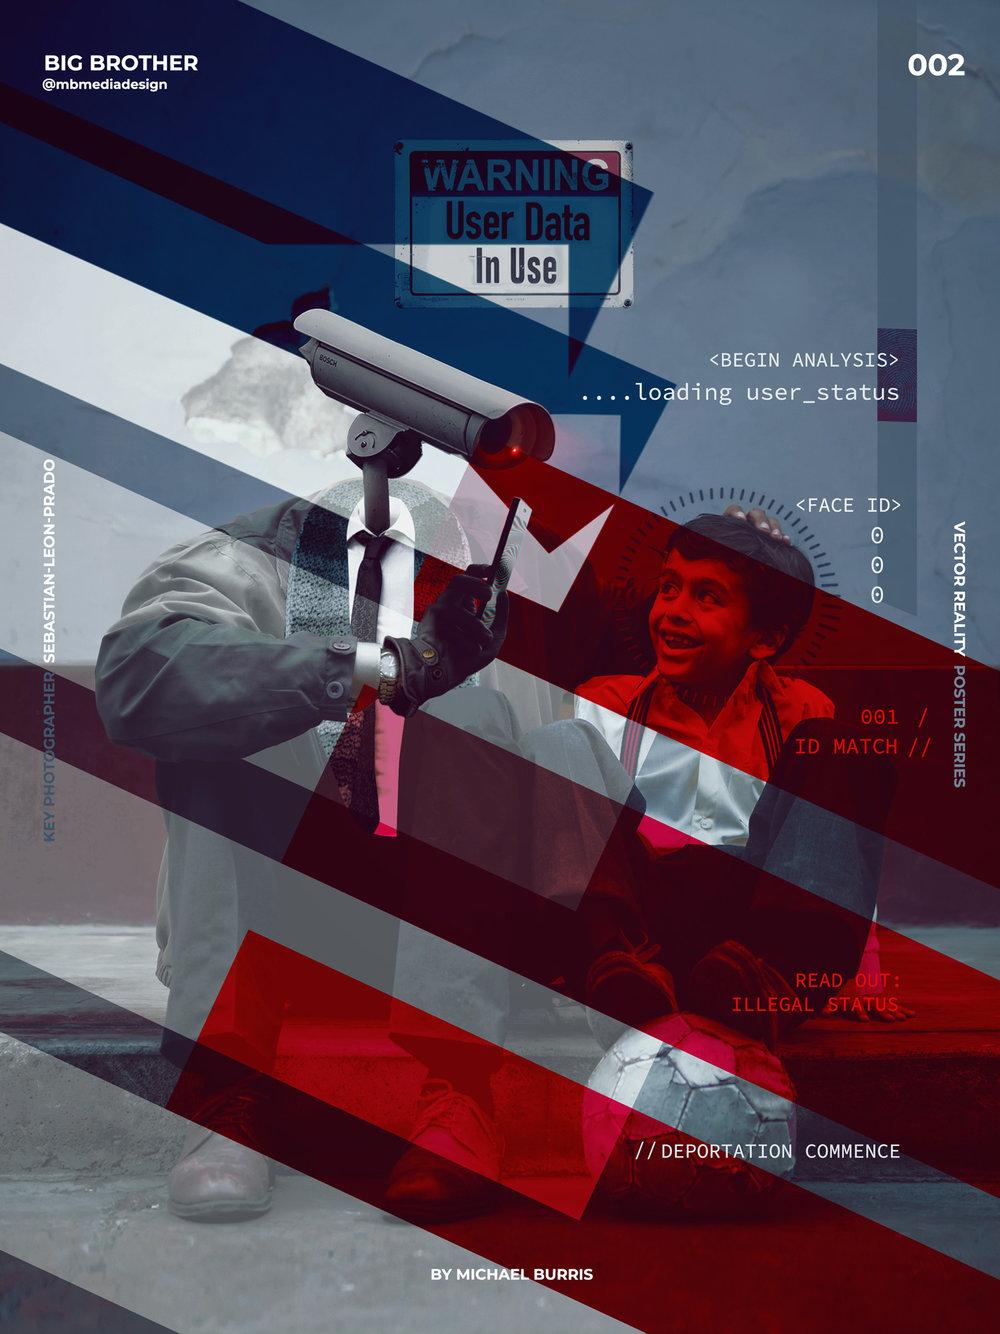 Big_Brother_VR-poster_002.jpg